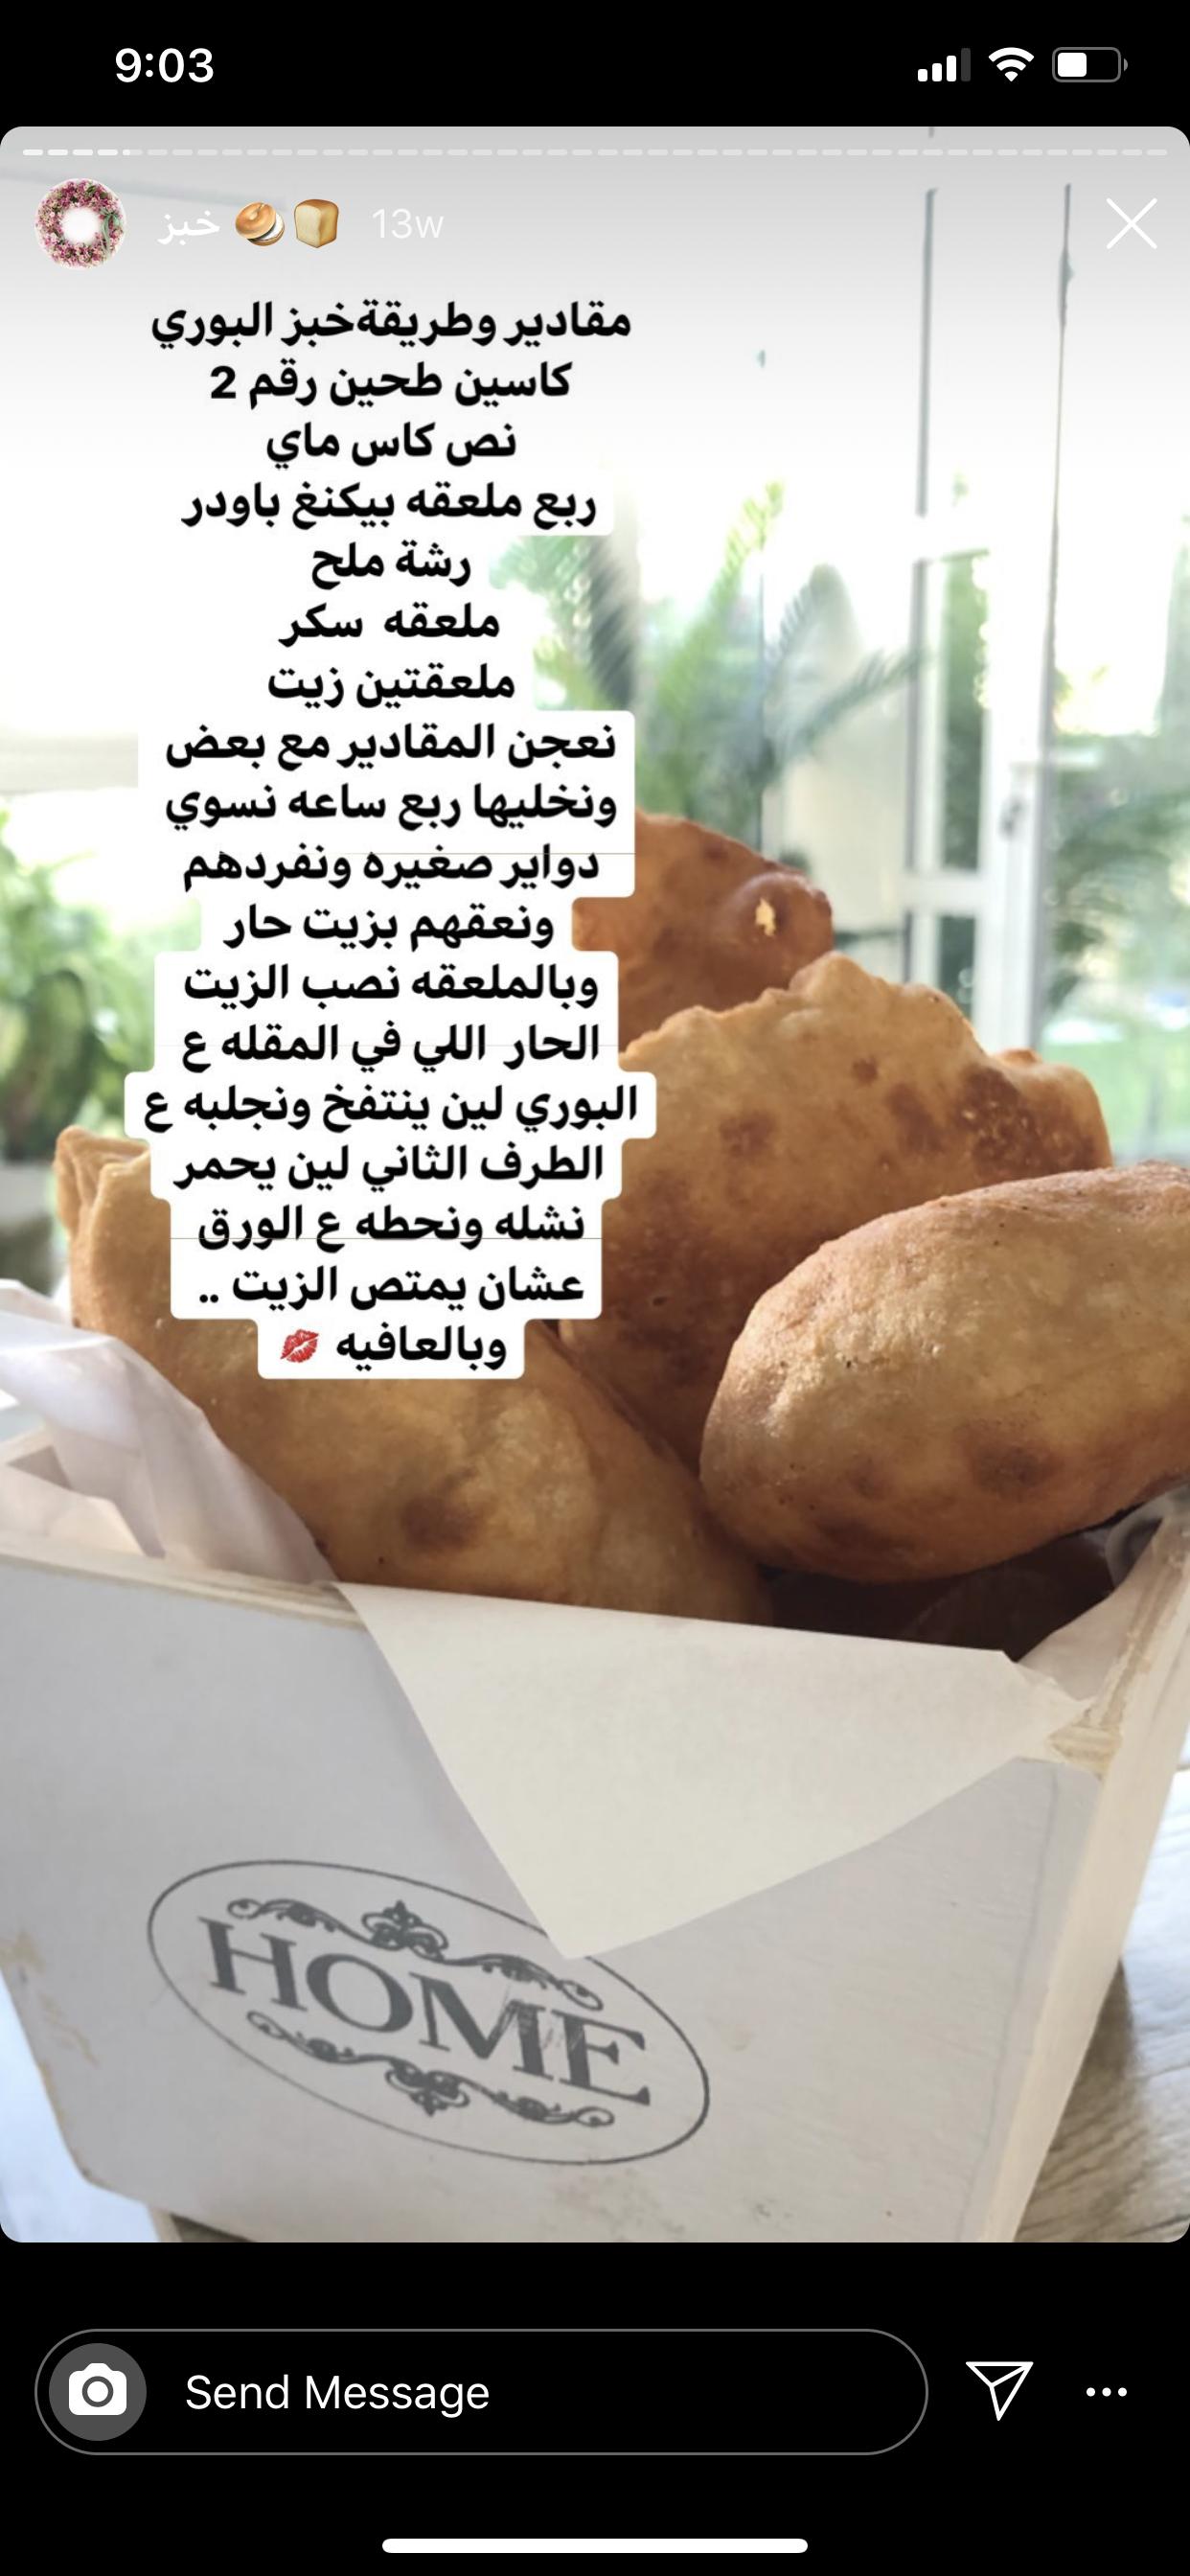 Pin By Maryam Alali On الخبز In 2020 Arabian Food Arabic Food Food